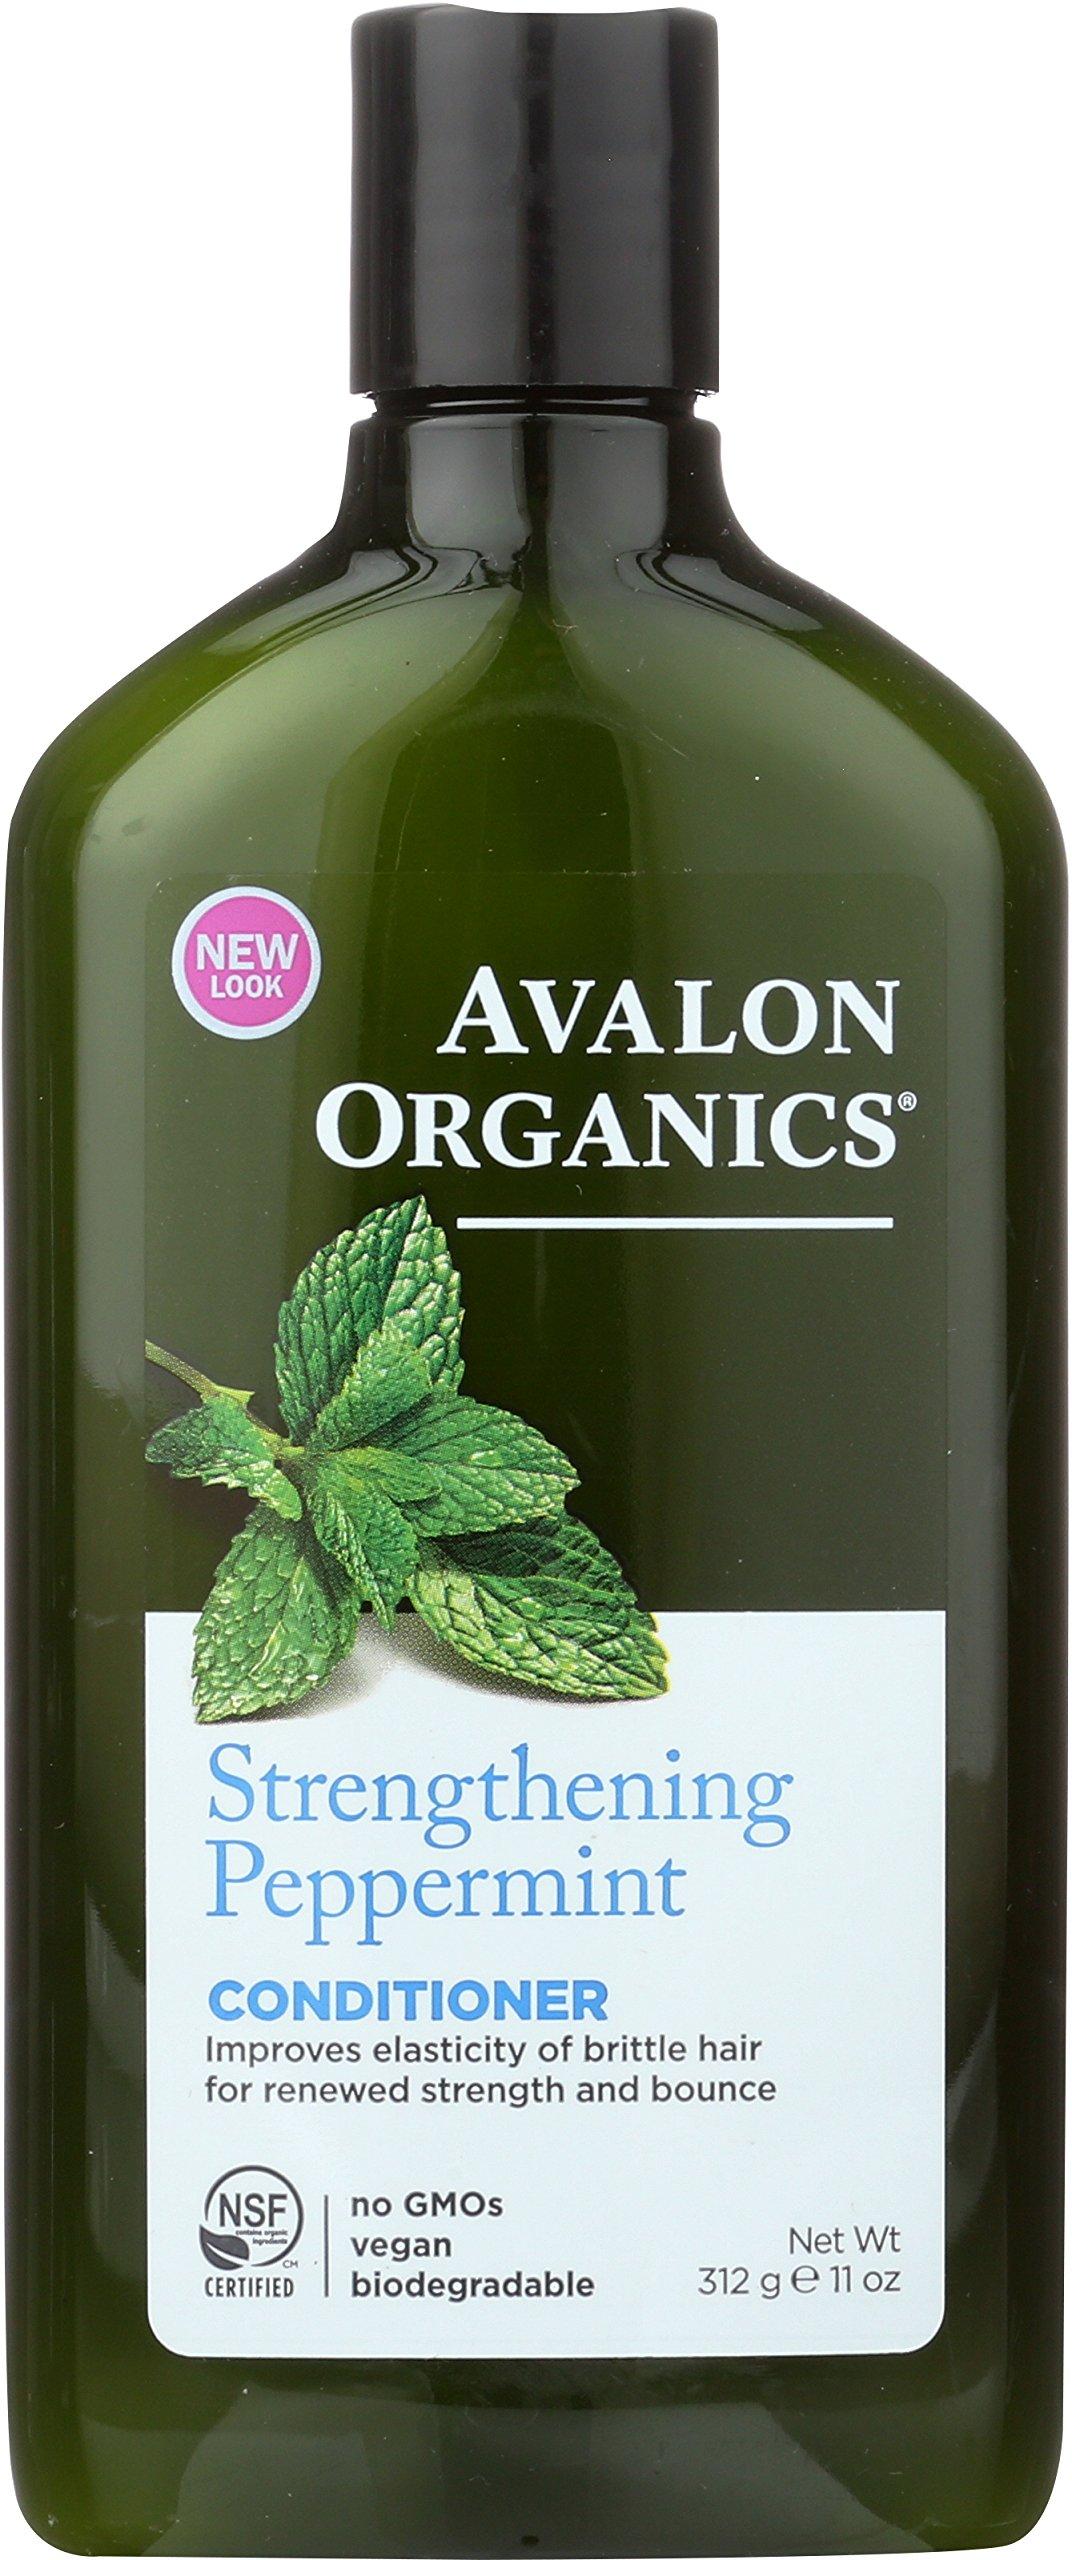 Avalon Organics Strengthening Peppermint Conditioner, 11 oz.